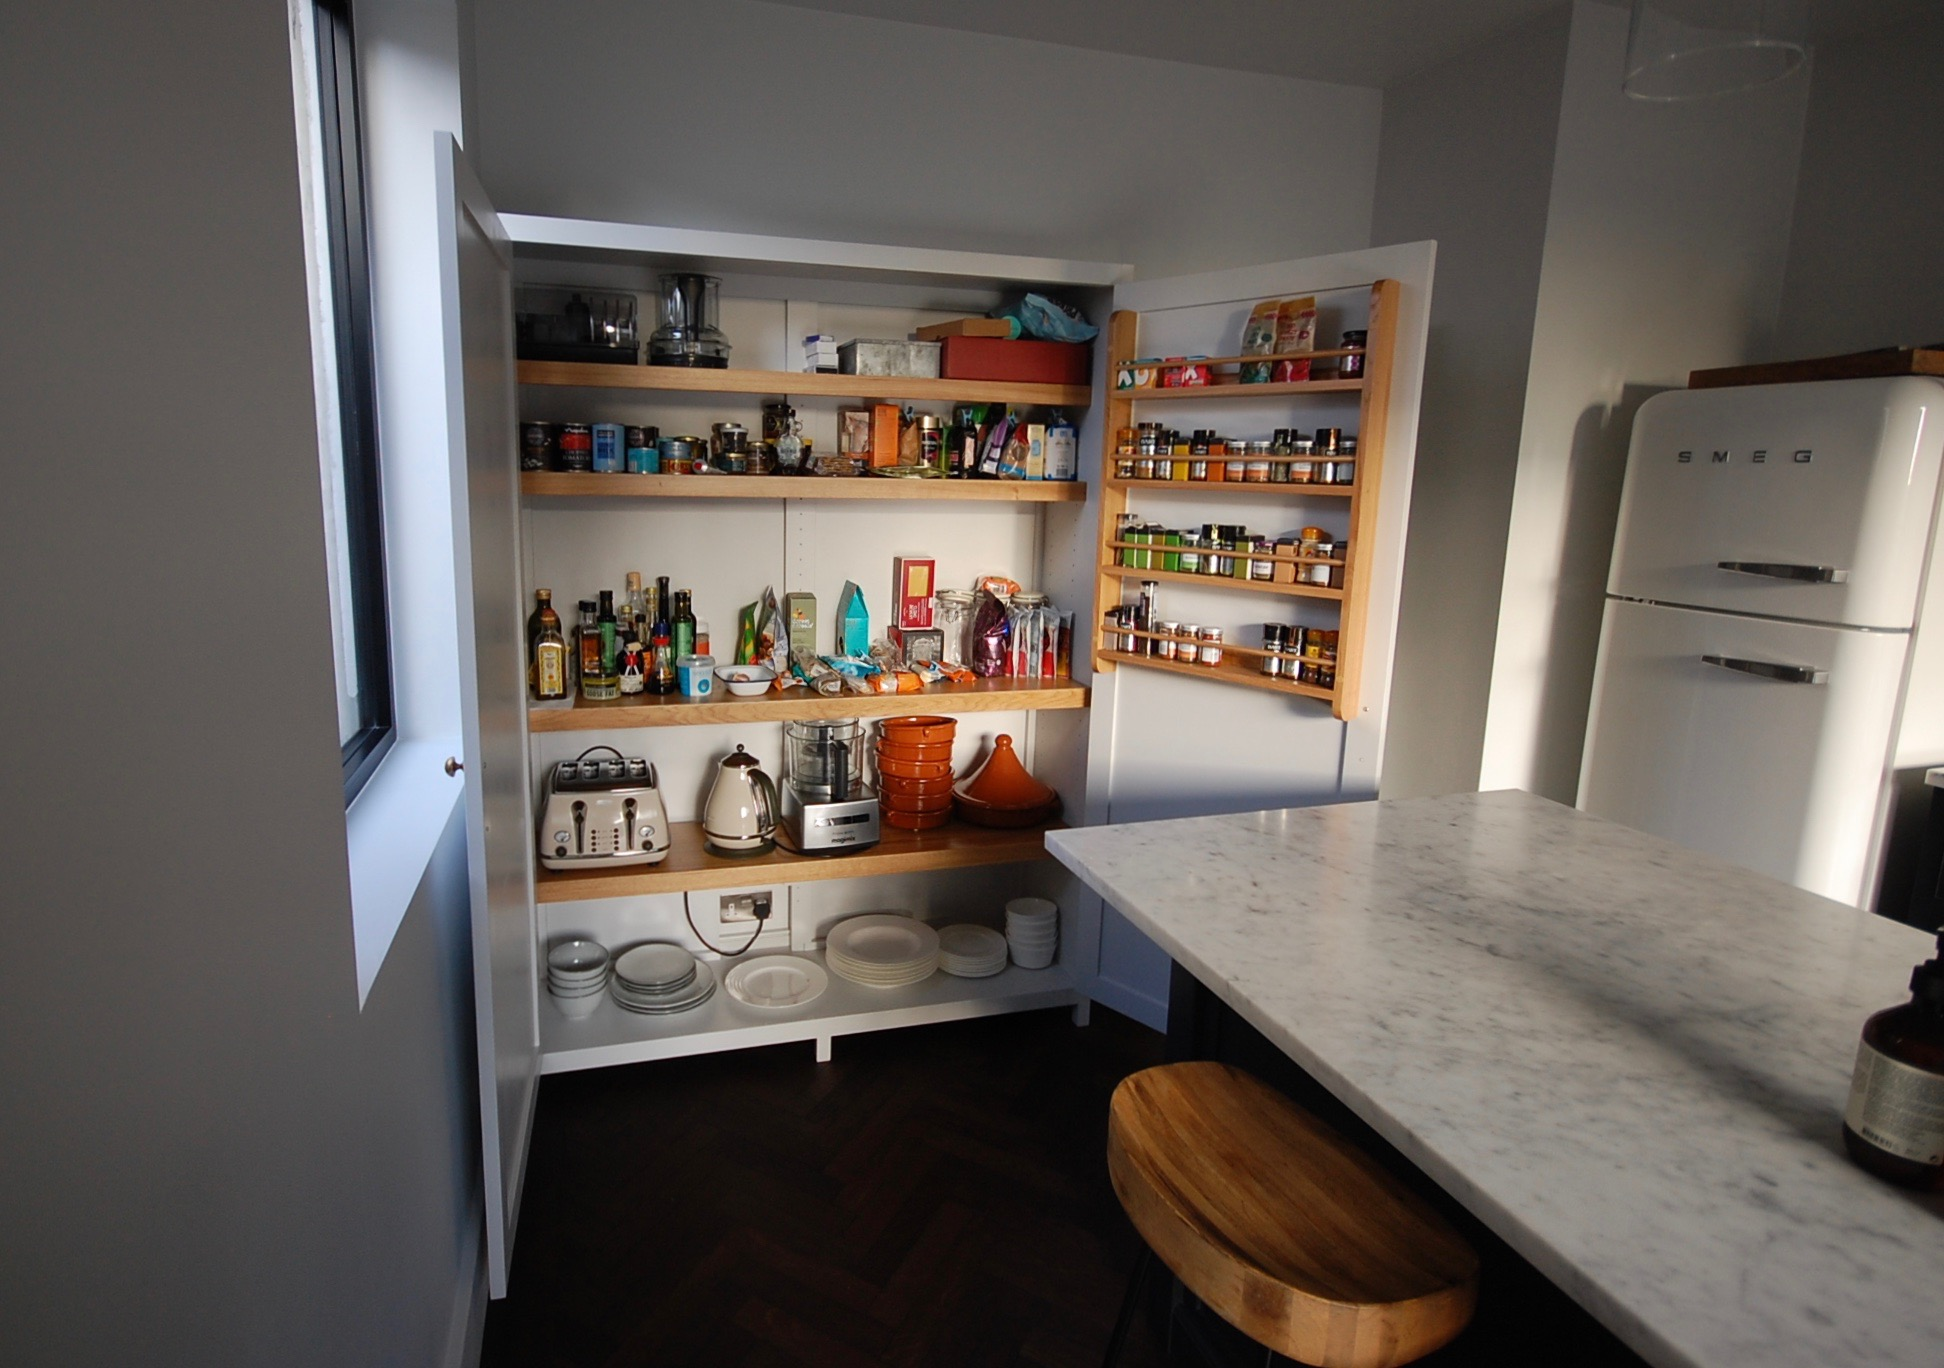 Grain_Bespoke_Furniture_Kitchen Larder_2.jpg